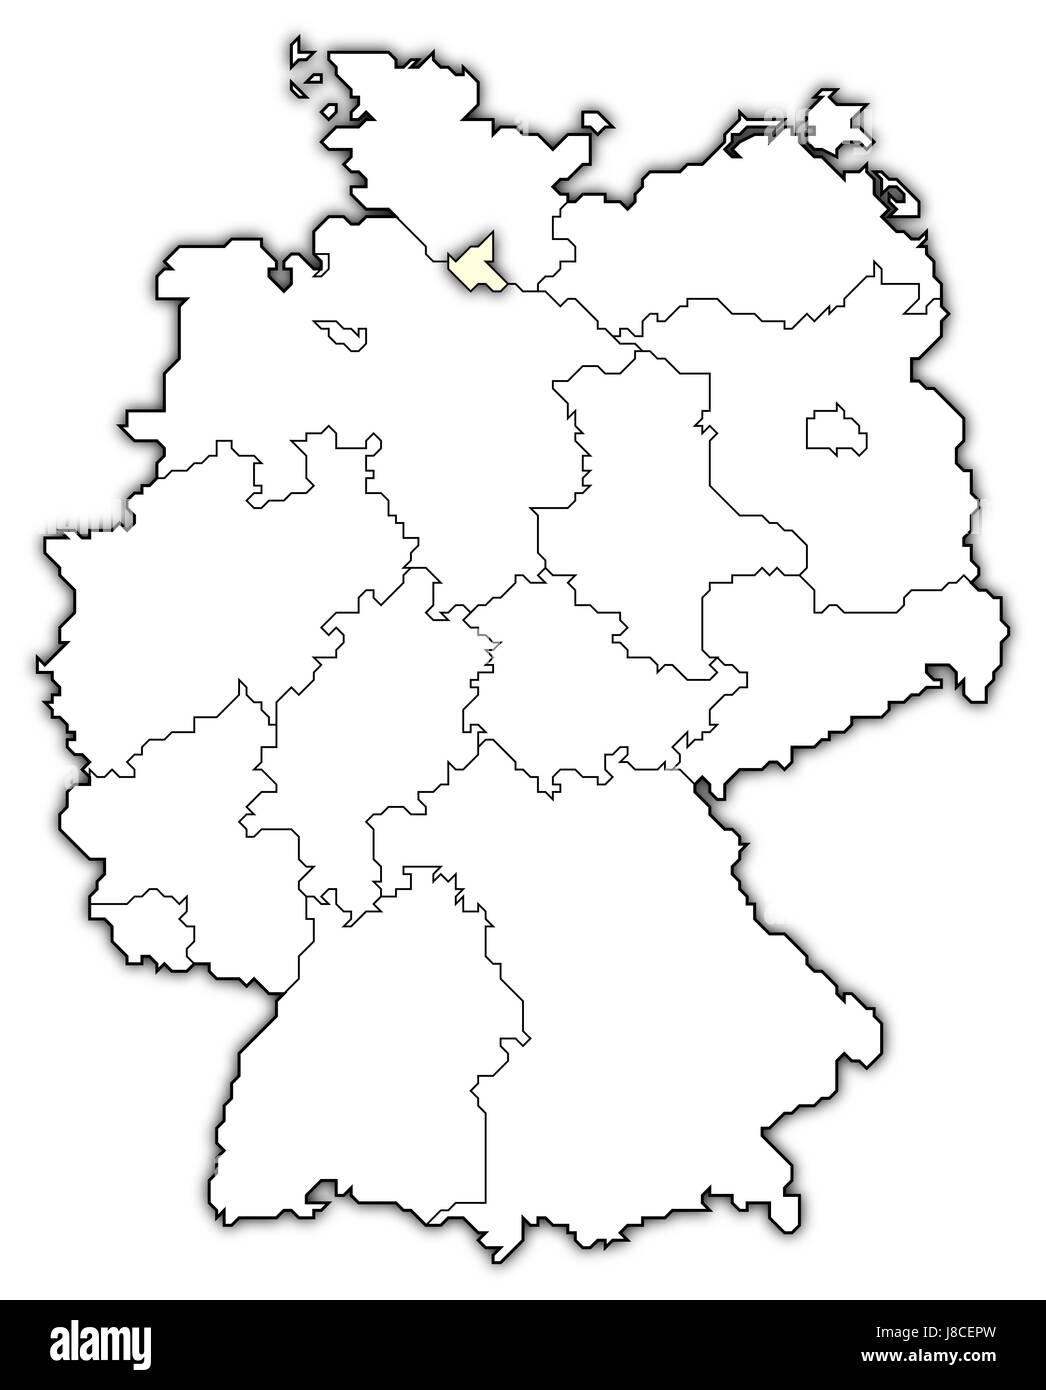 map of germany,hamburg highlighted - Stock Image